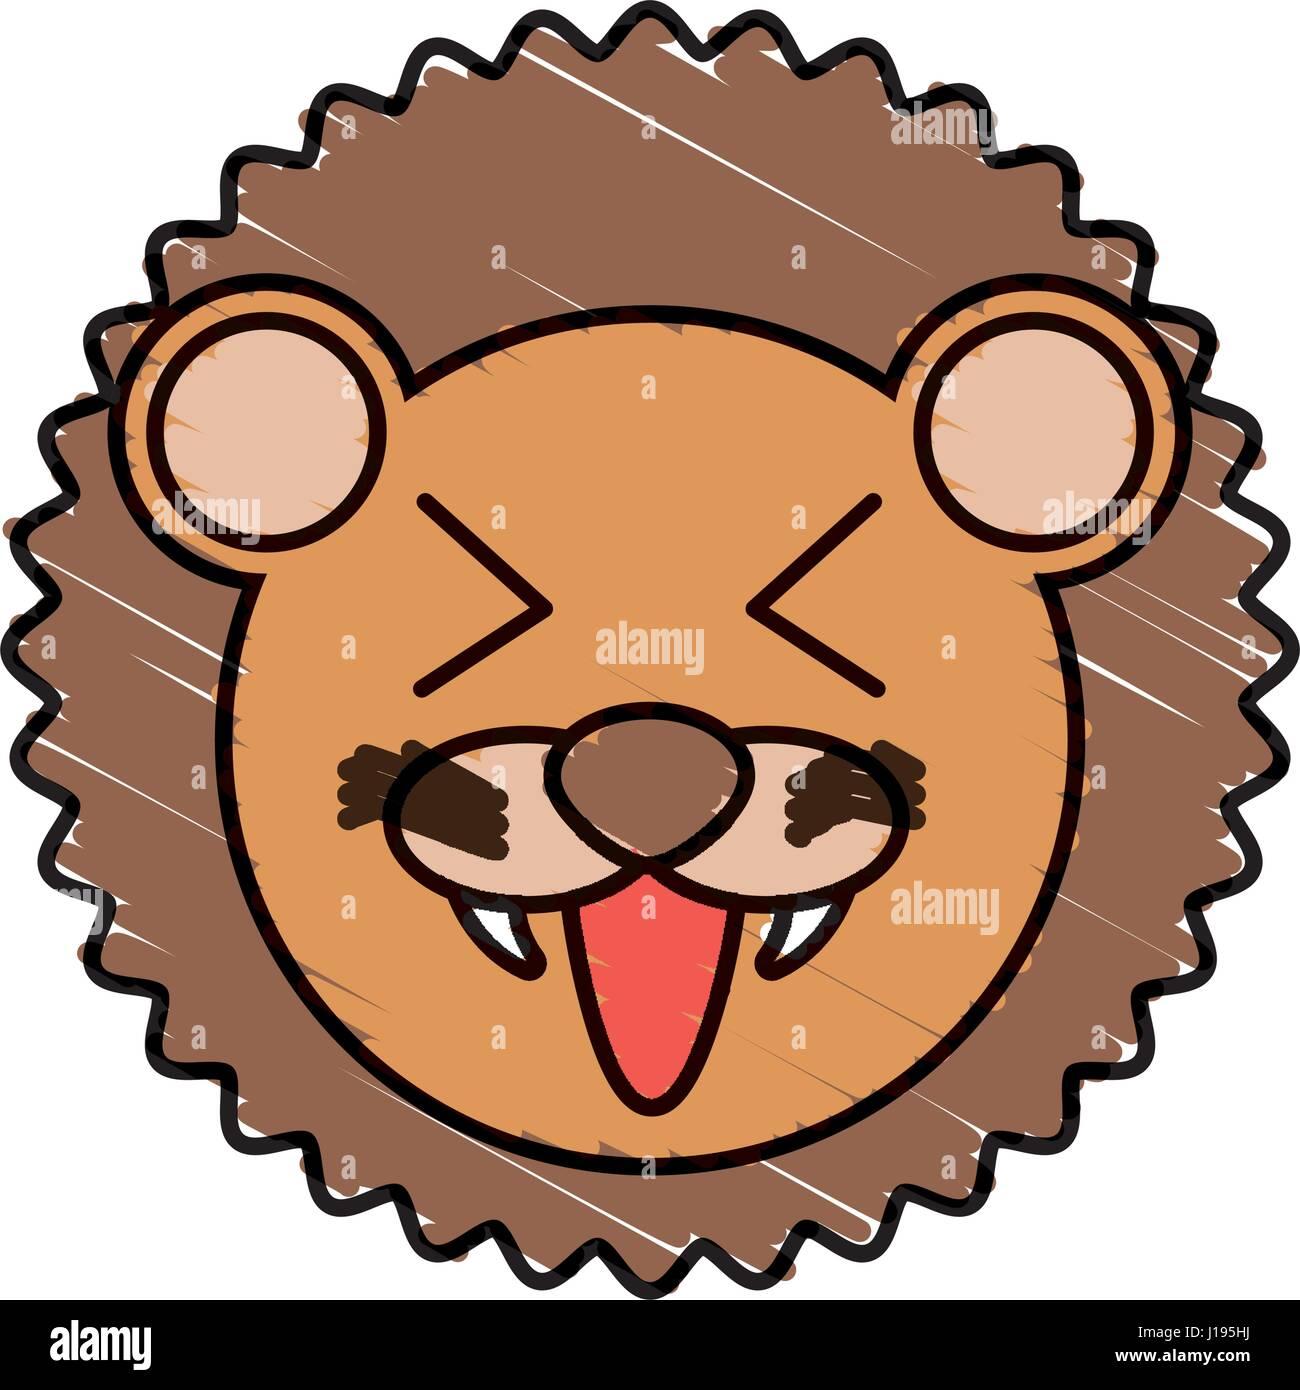 Uncategorized Cute Lion Drawing cute lion drawing animal stock vector art illustration animal